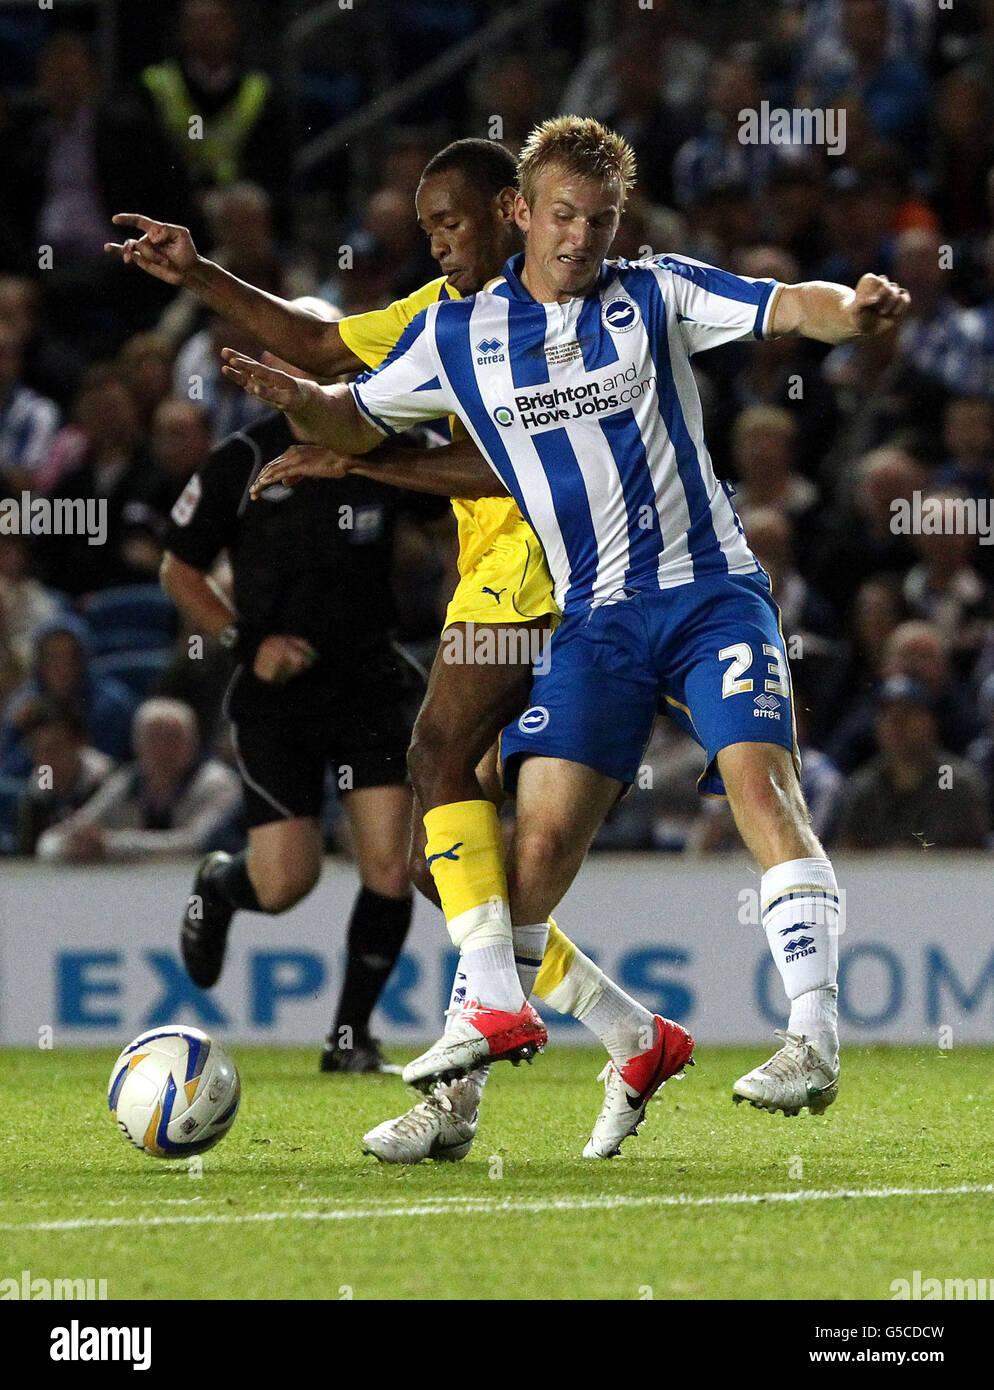 Soccer - Pre-Season Friendly - Brighton and Hove Albion v Reading - AMEX Stadium - Stock Image